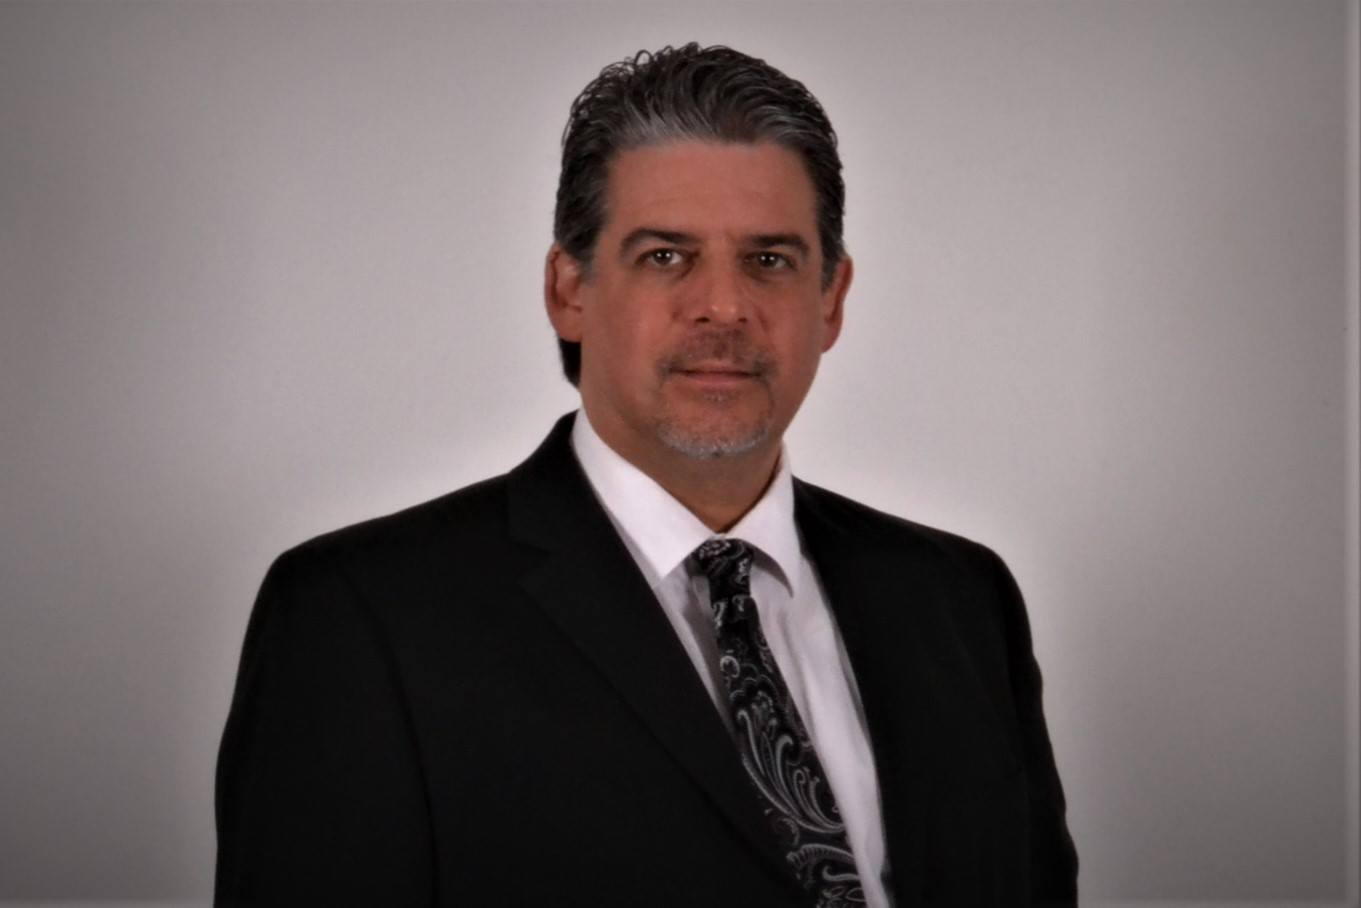 Jerry Hawley